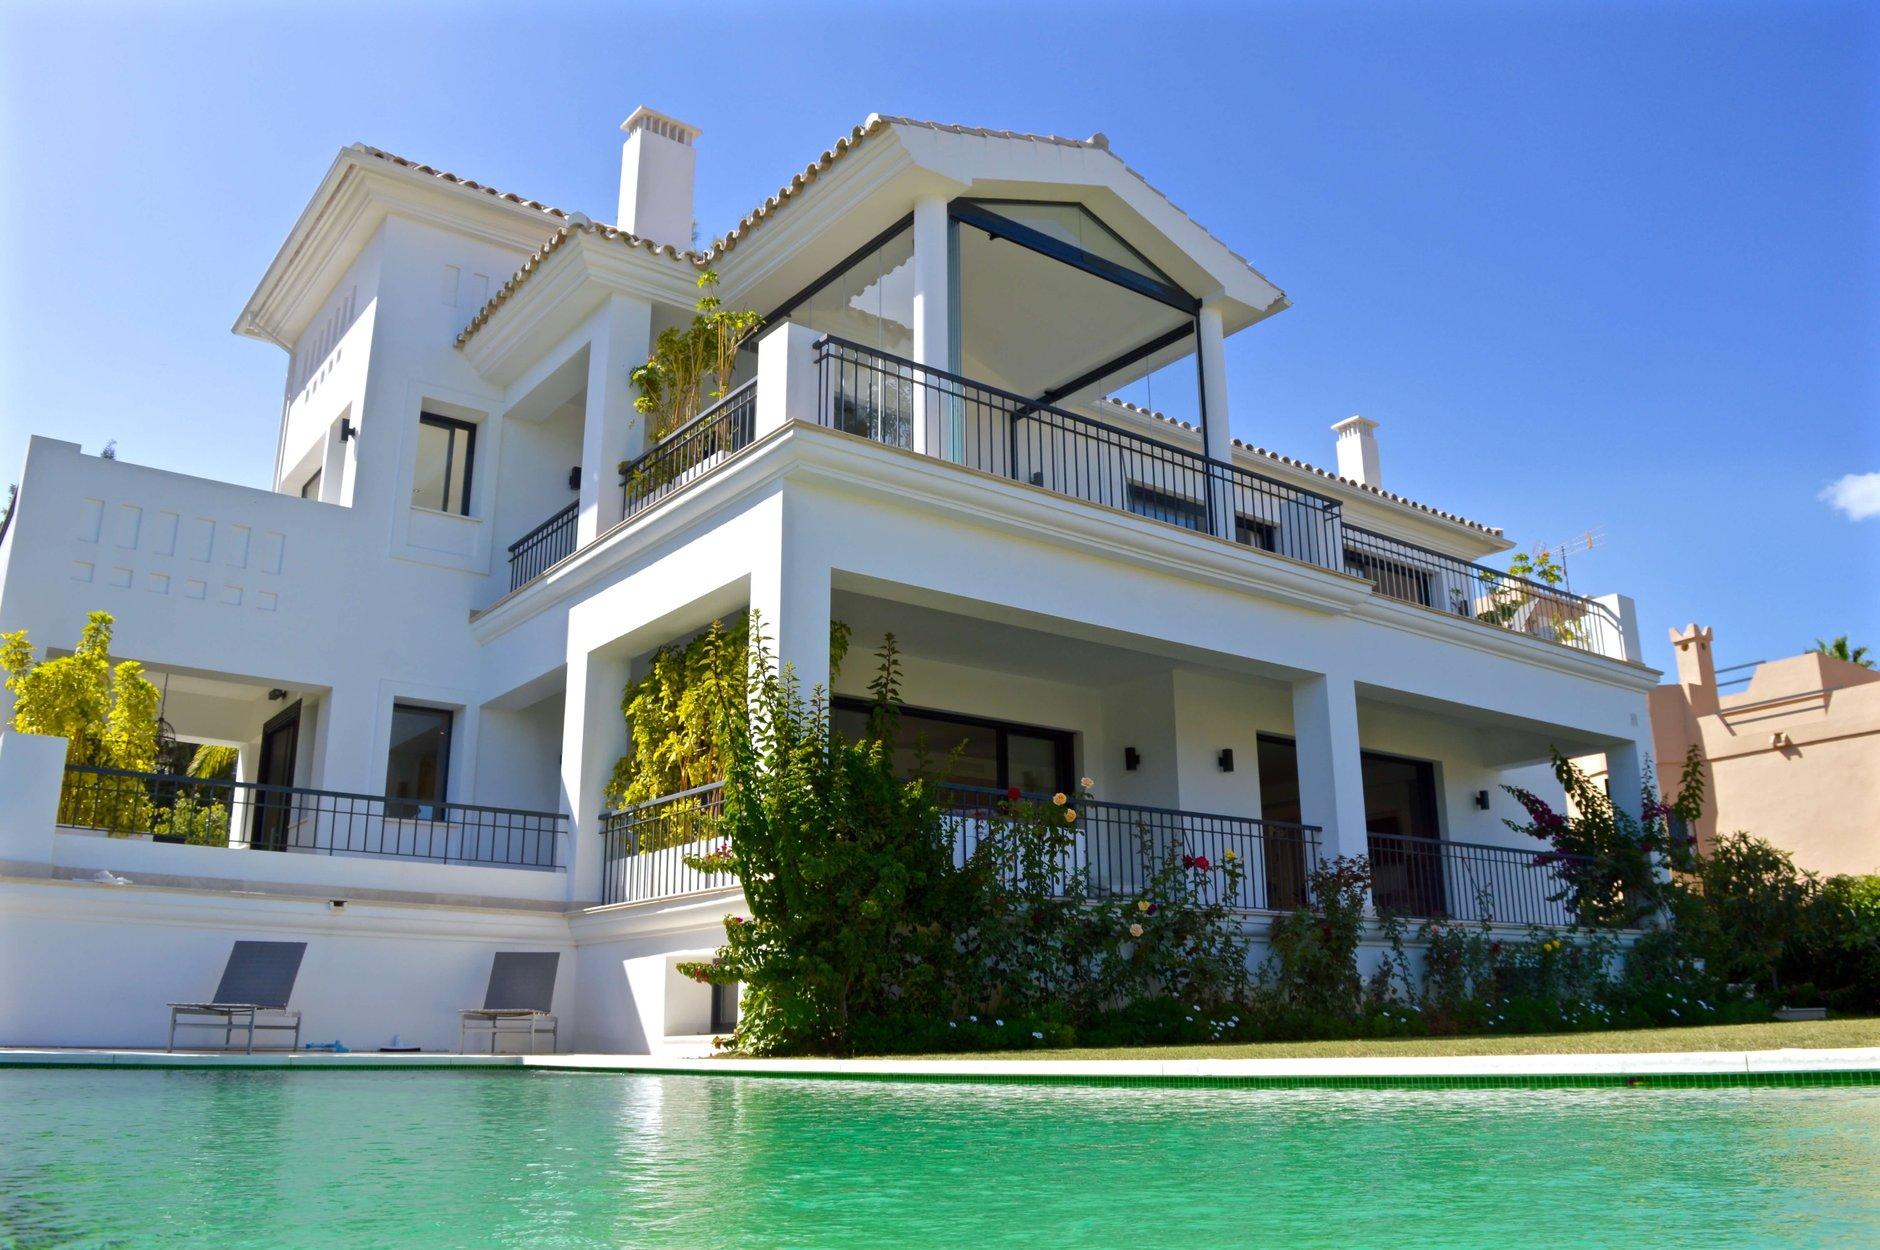 aaa5 bedroom Villa in Nueva Andalucia, Marbella | M141365